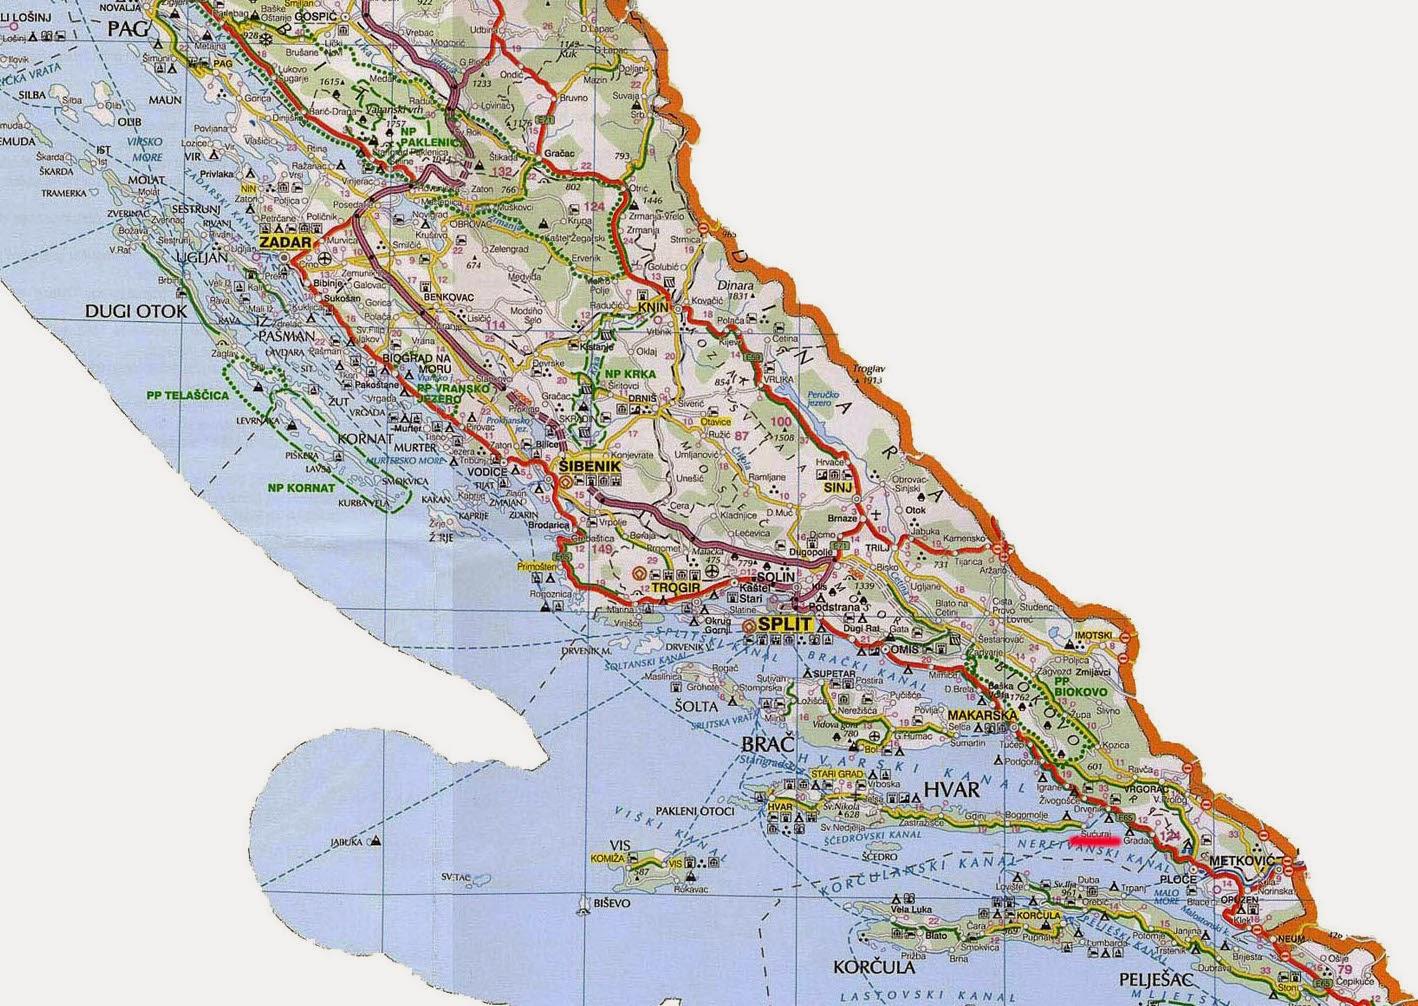 Aprendendo Croata: DALMACIJA